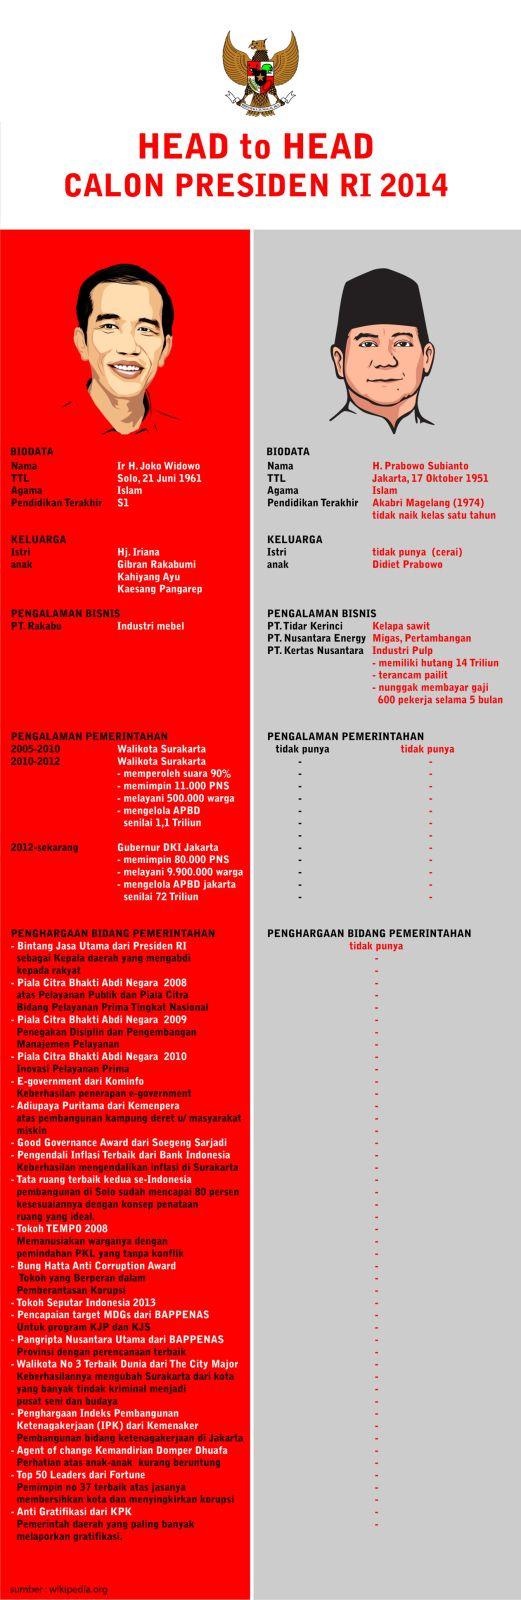 Head to head Jokowi & Prabowo